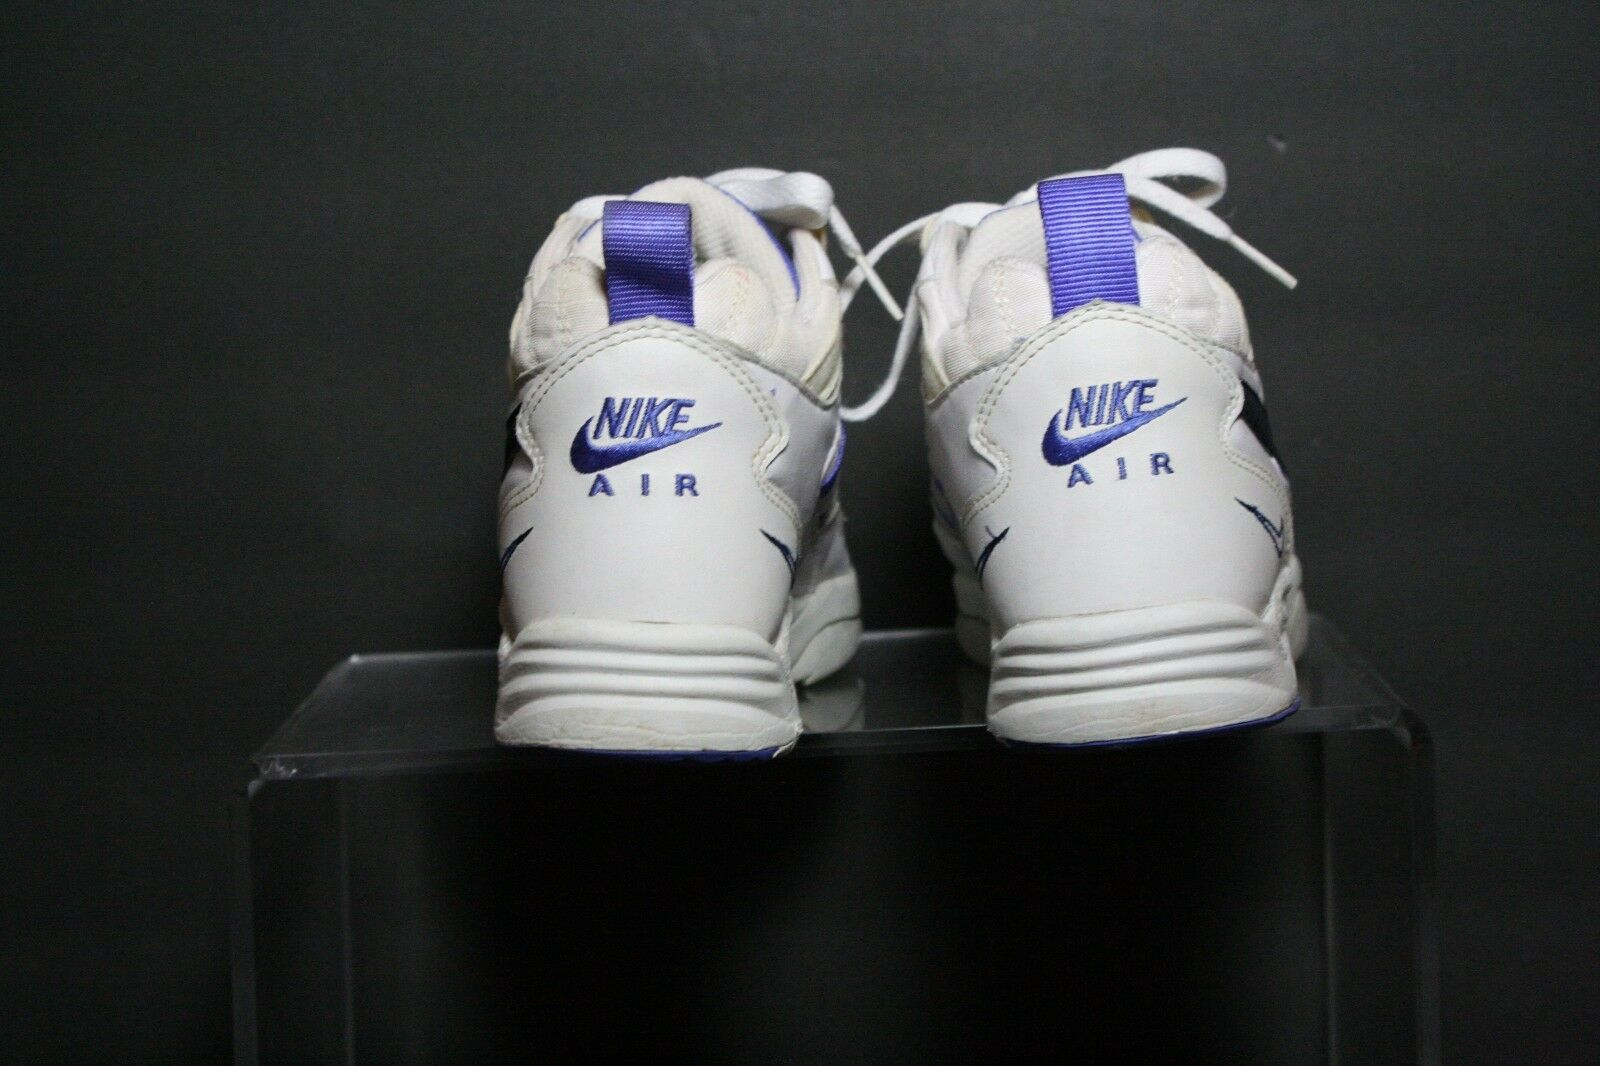 nike air edge - ii - mitte hipster 1995